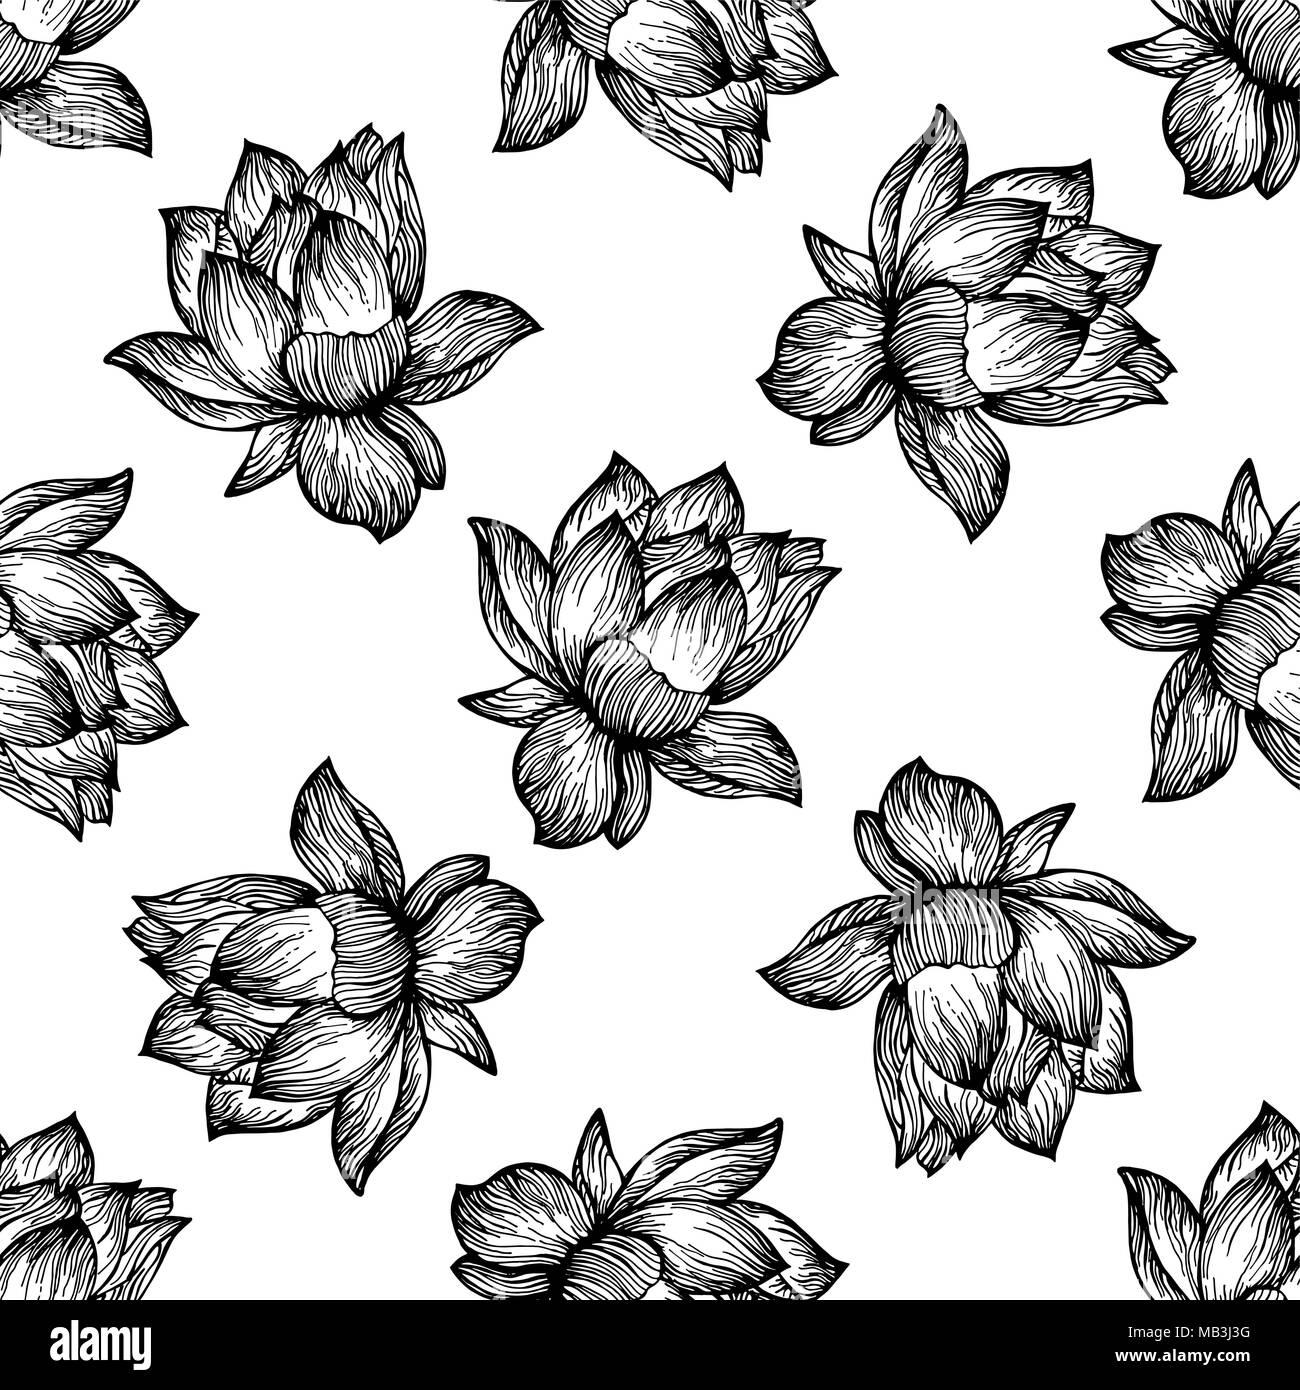 Seamless pattern of hand drawn sketch style lotus flowers isolated seamless pattern of hand drawn sketch style lotus flowers isolated on white background vector illustration izmirmasajfo